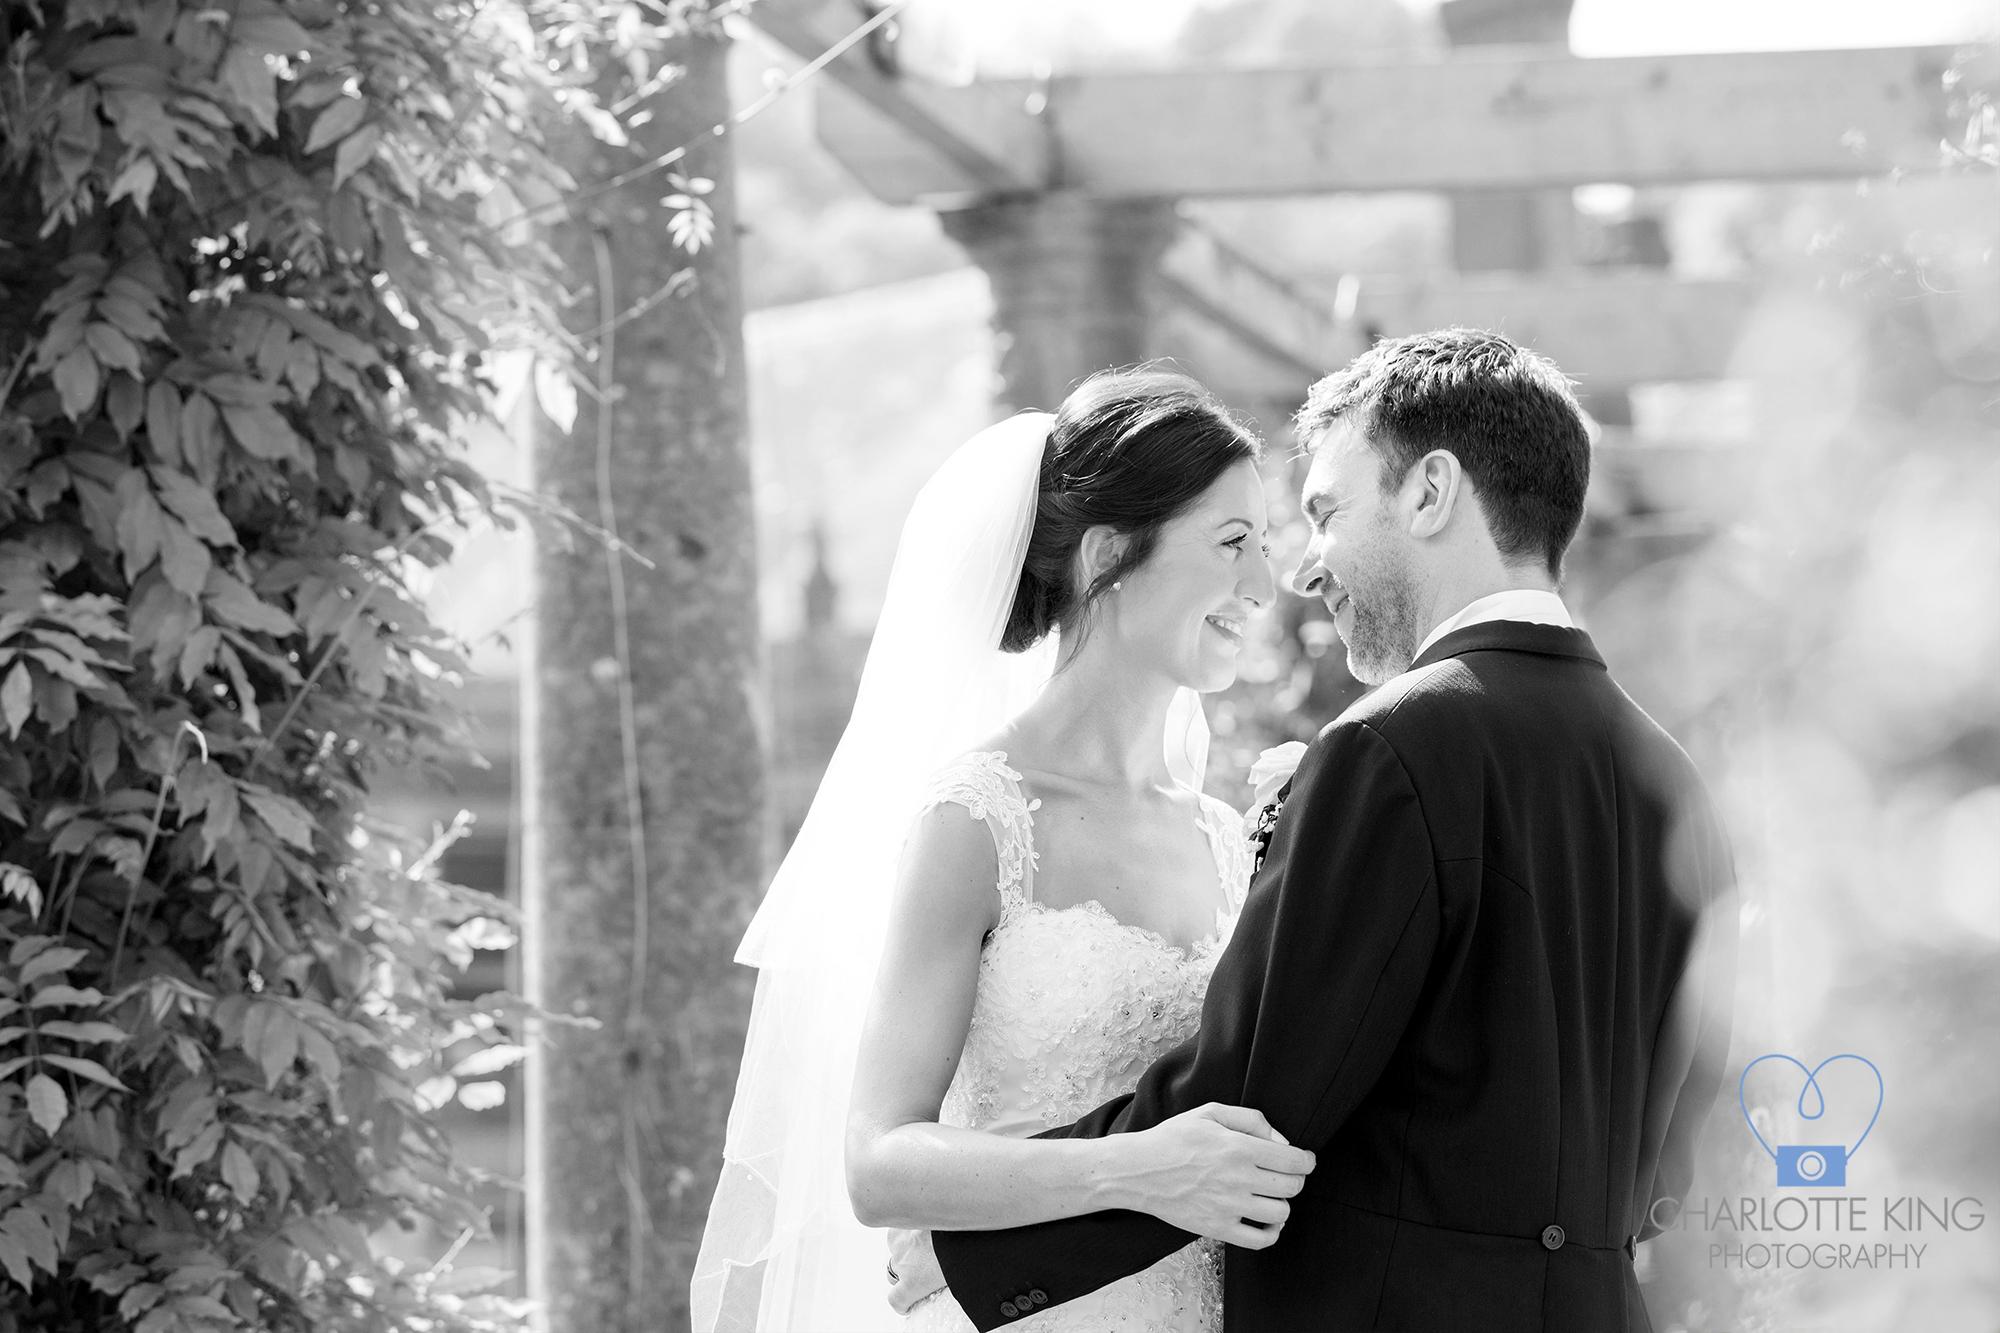 Woldingham-school-wedding-charlotte-king-photography (133)